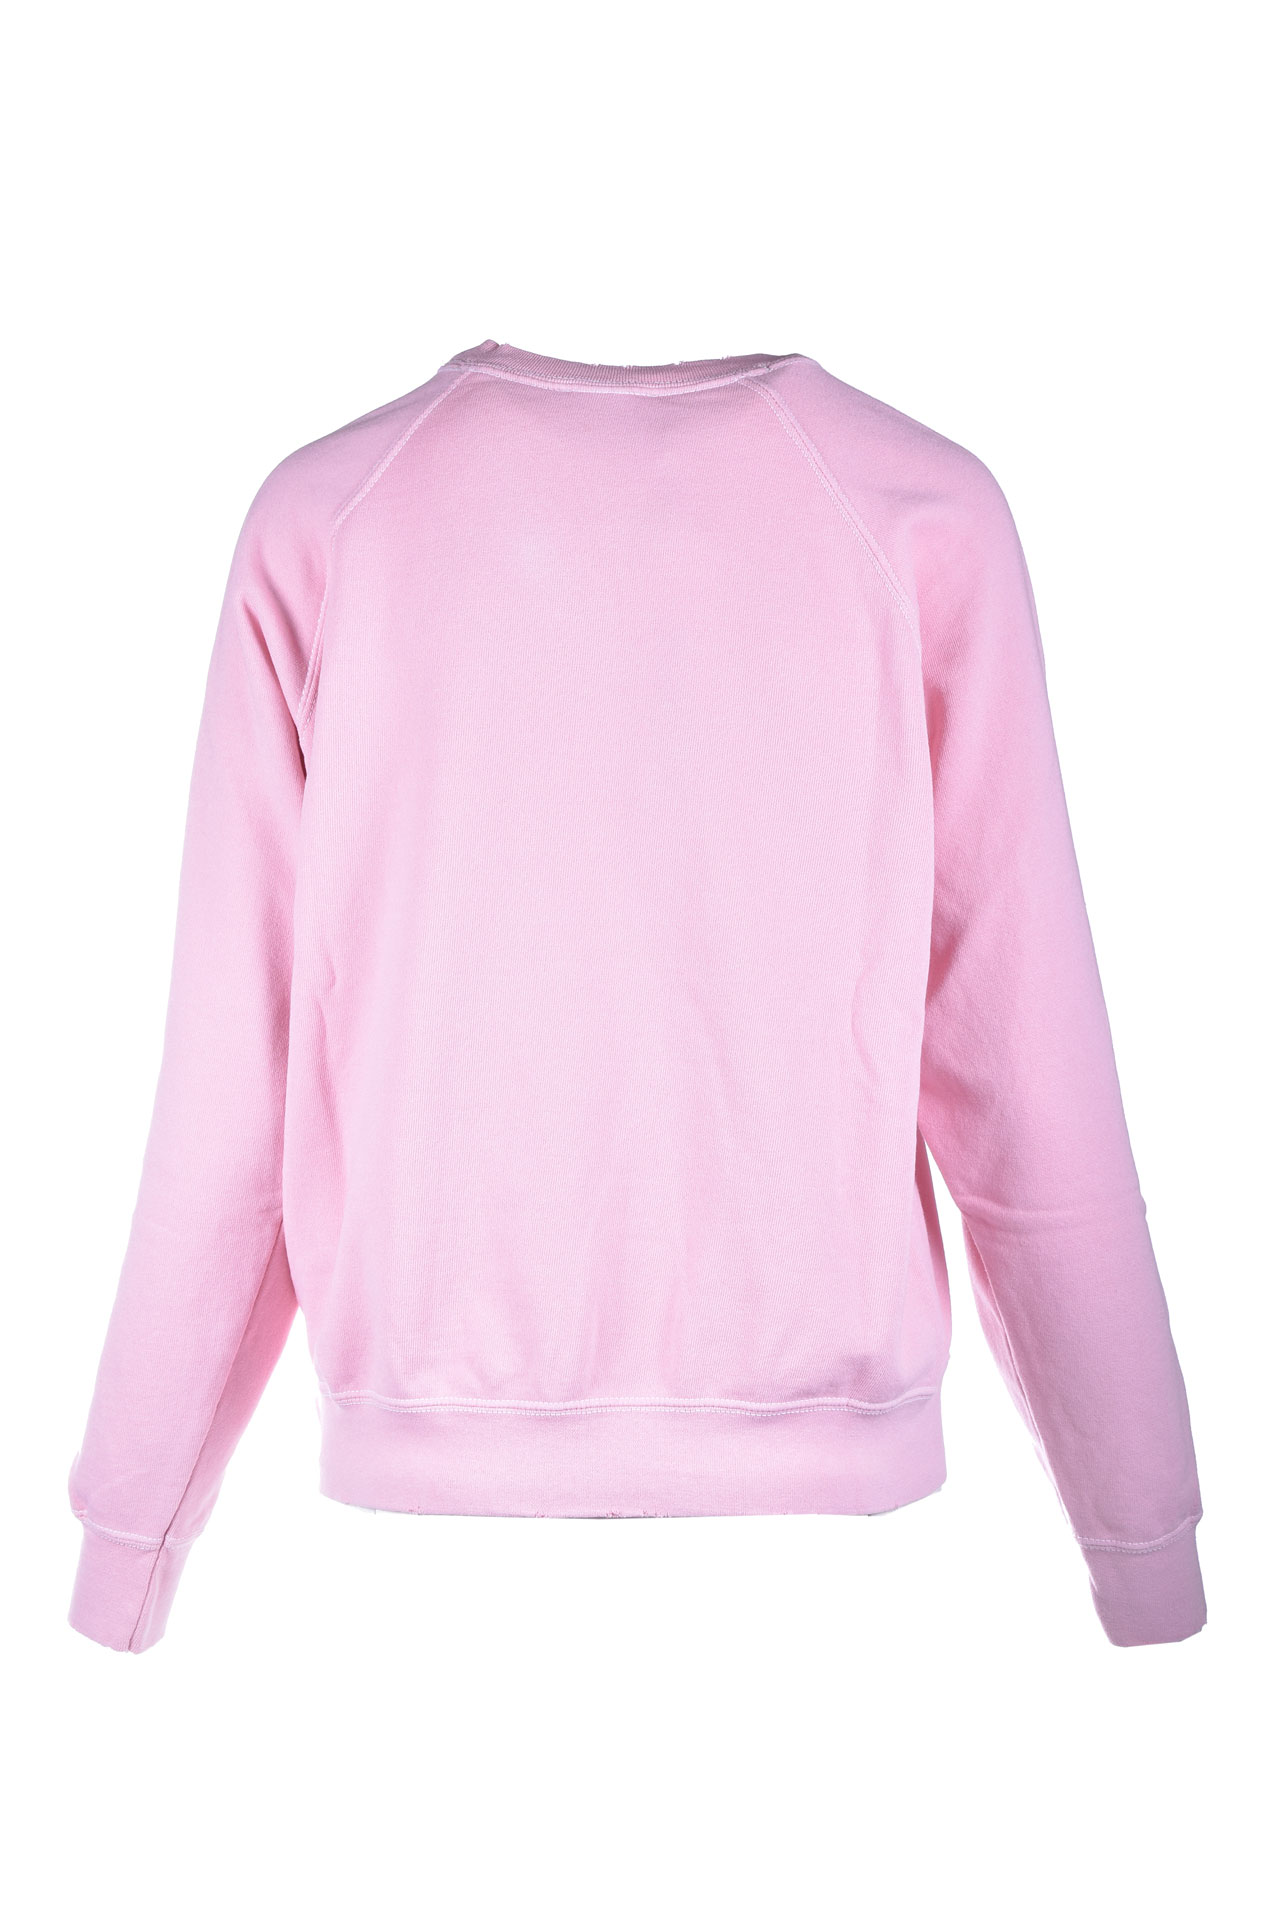 Pink crewneck sweatshirt with white printed logo SEMICOUTURE   Sweatshirt   Y1SJ21H04